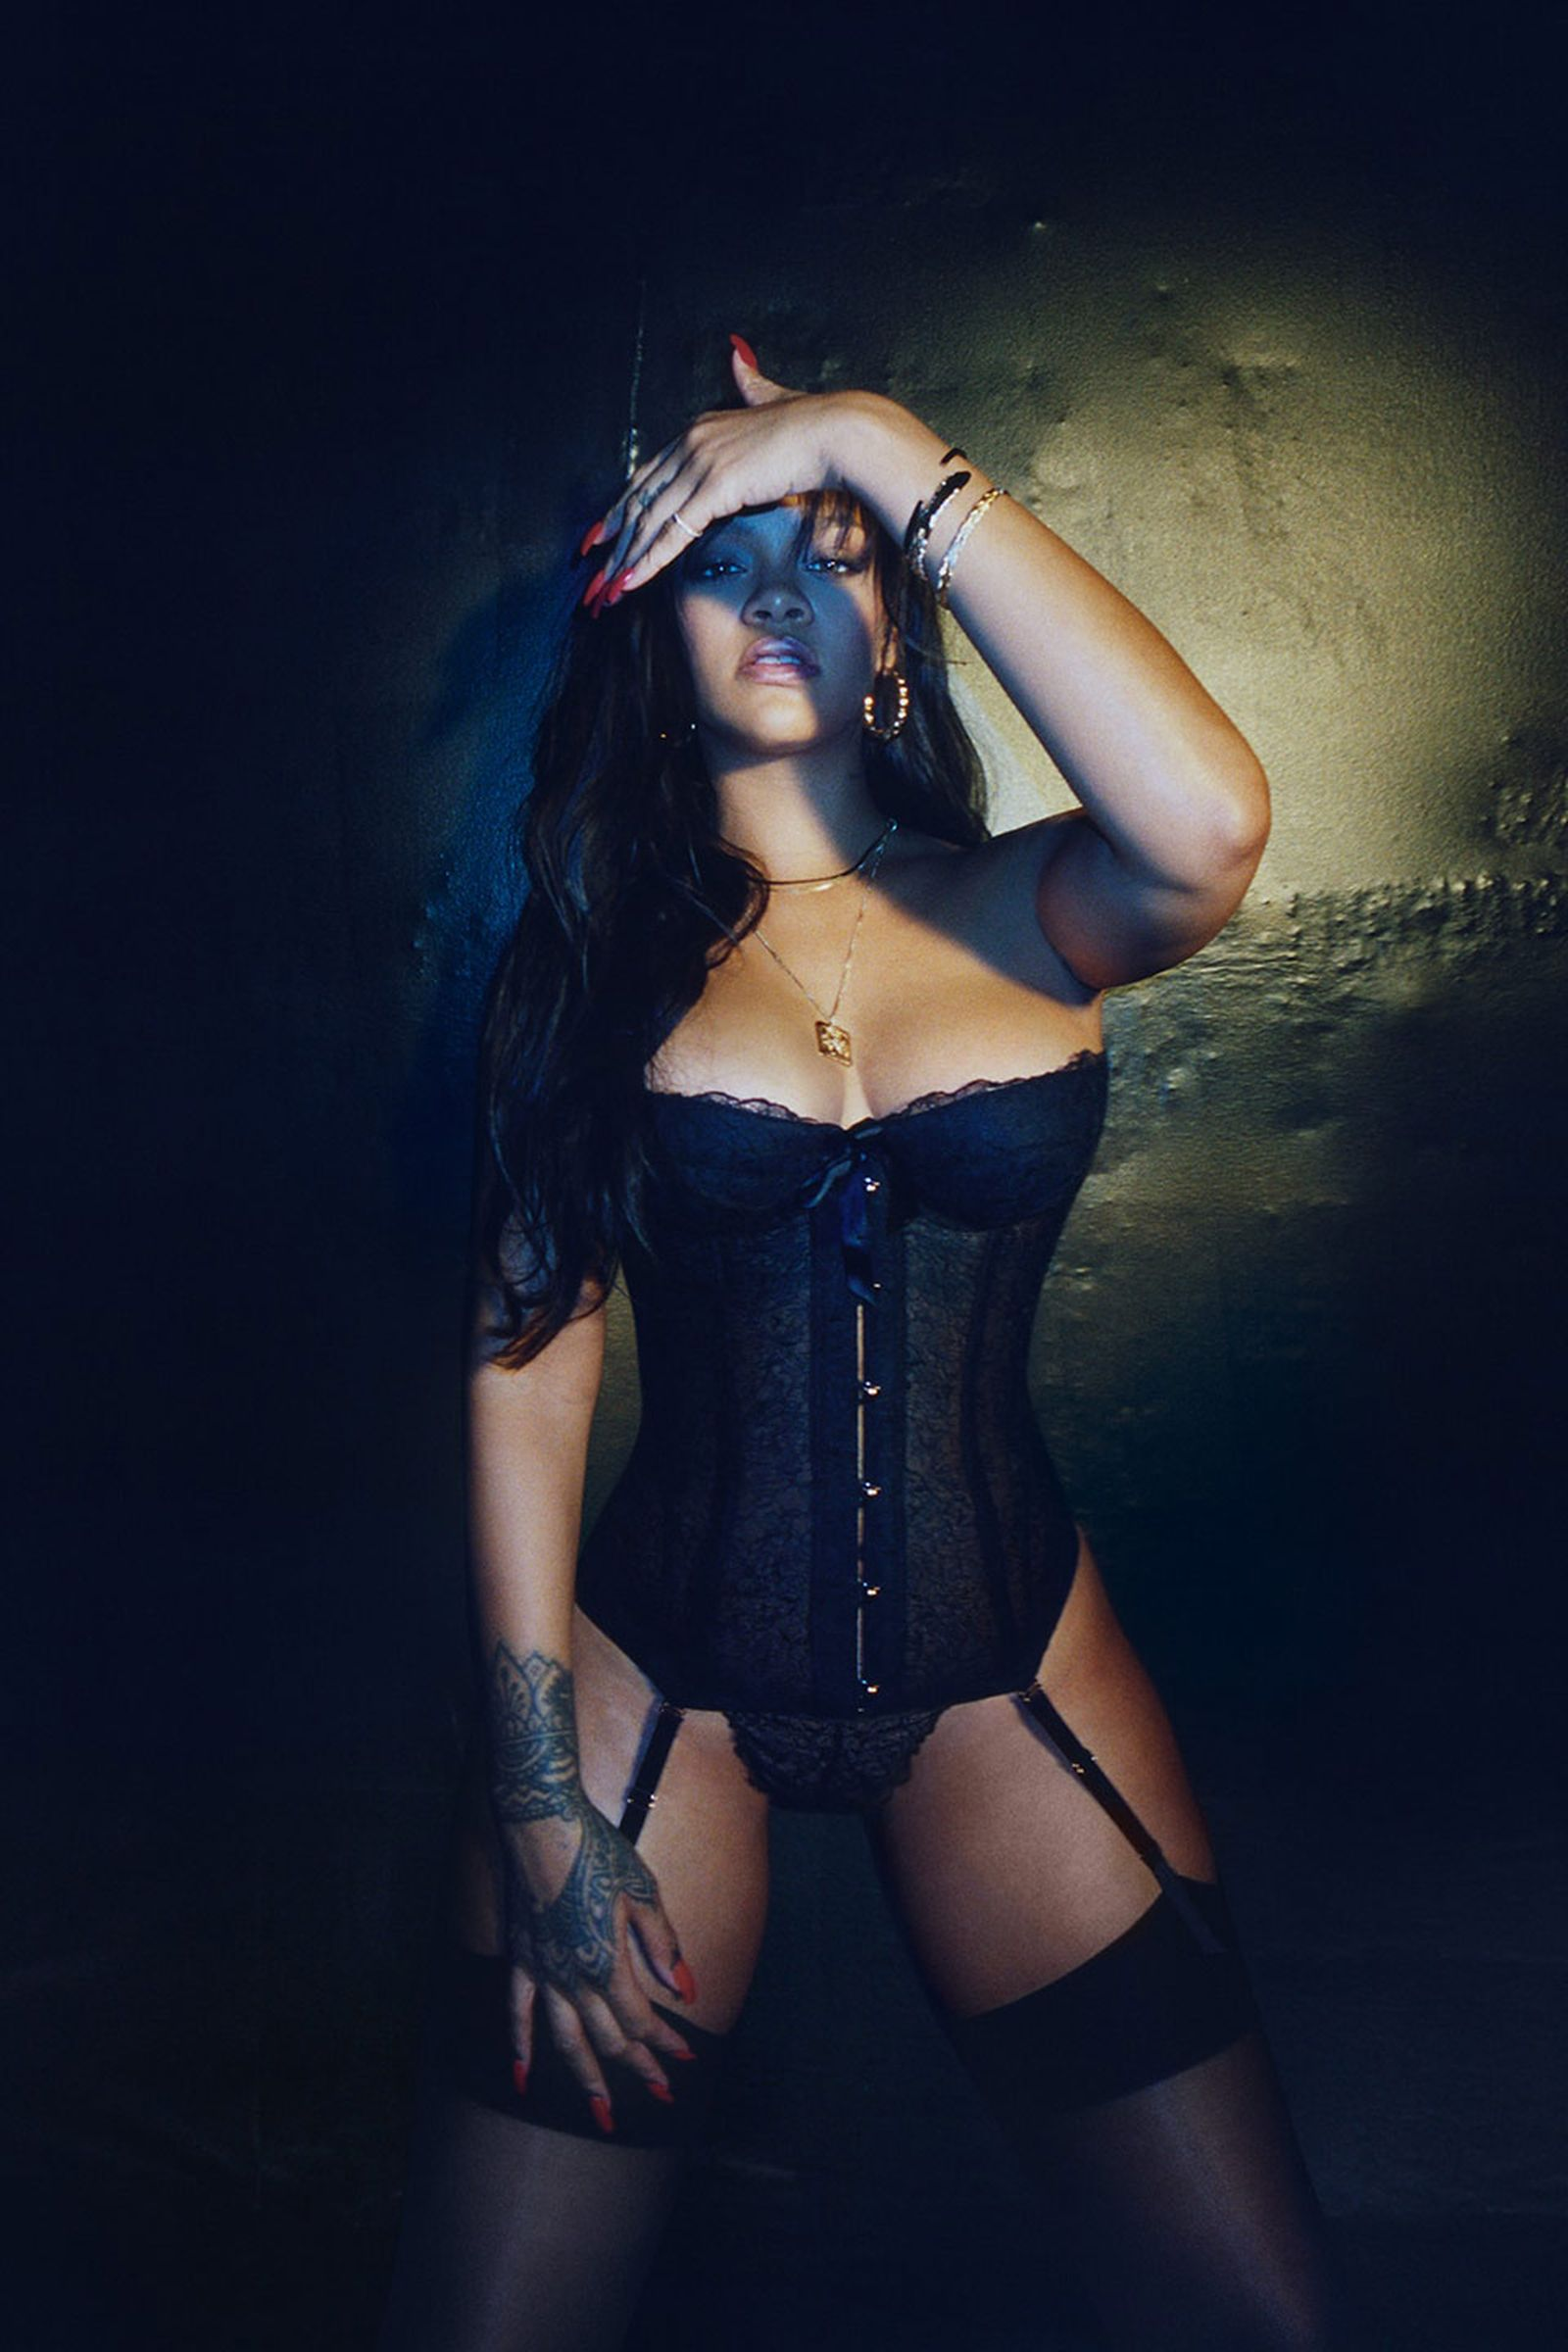 rihanna-savage-fenty-lingerie-first-look-05